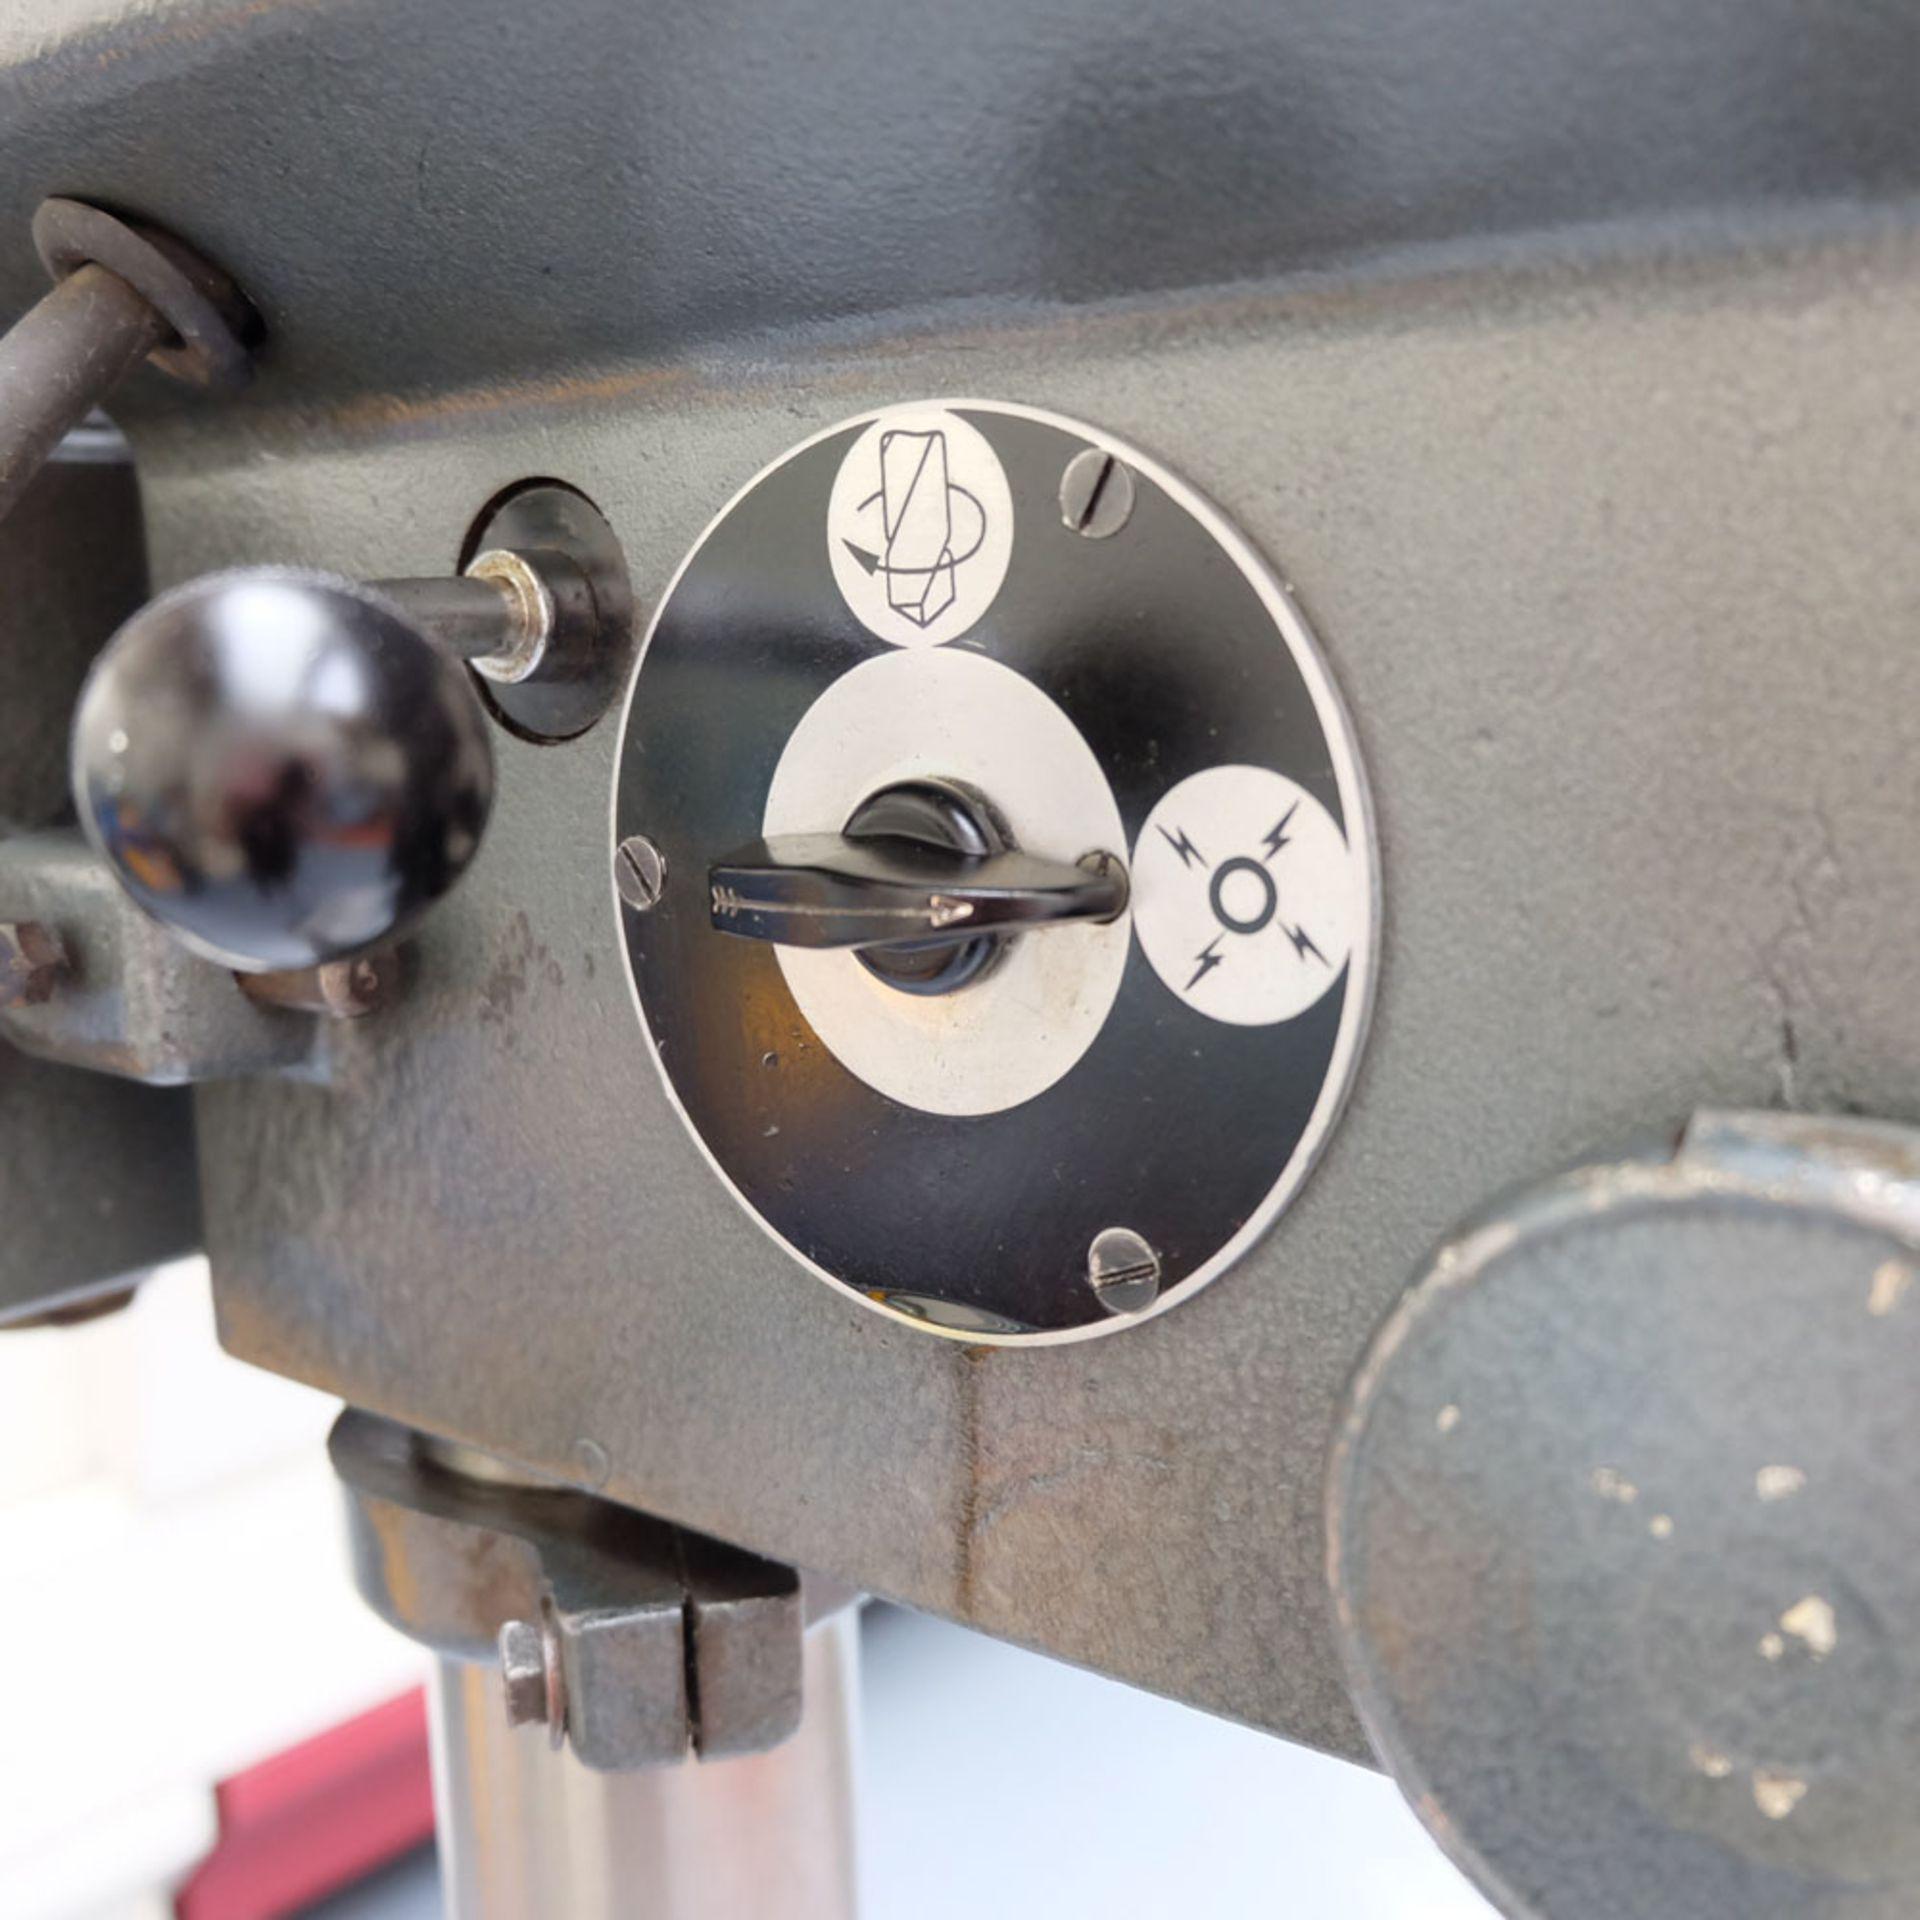 "Meddings Type Driltru Pillar Drill. Capacity 1/2"". 5 Speeds 500 - 4000rpm. - Image 6 of 7"